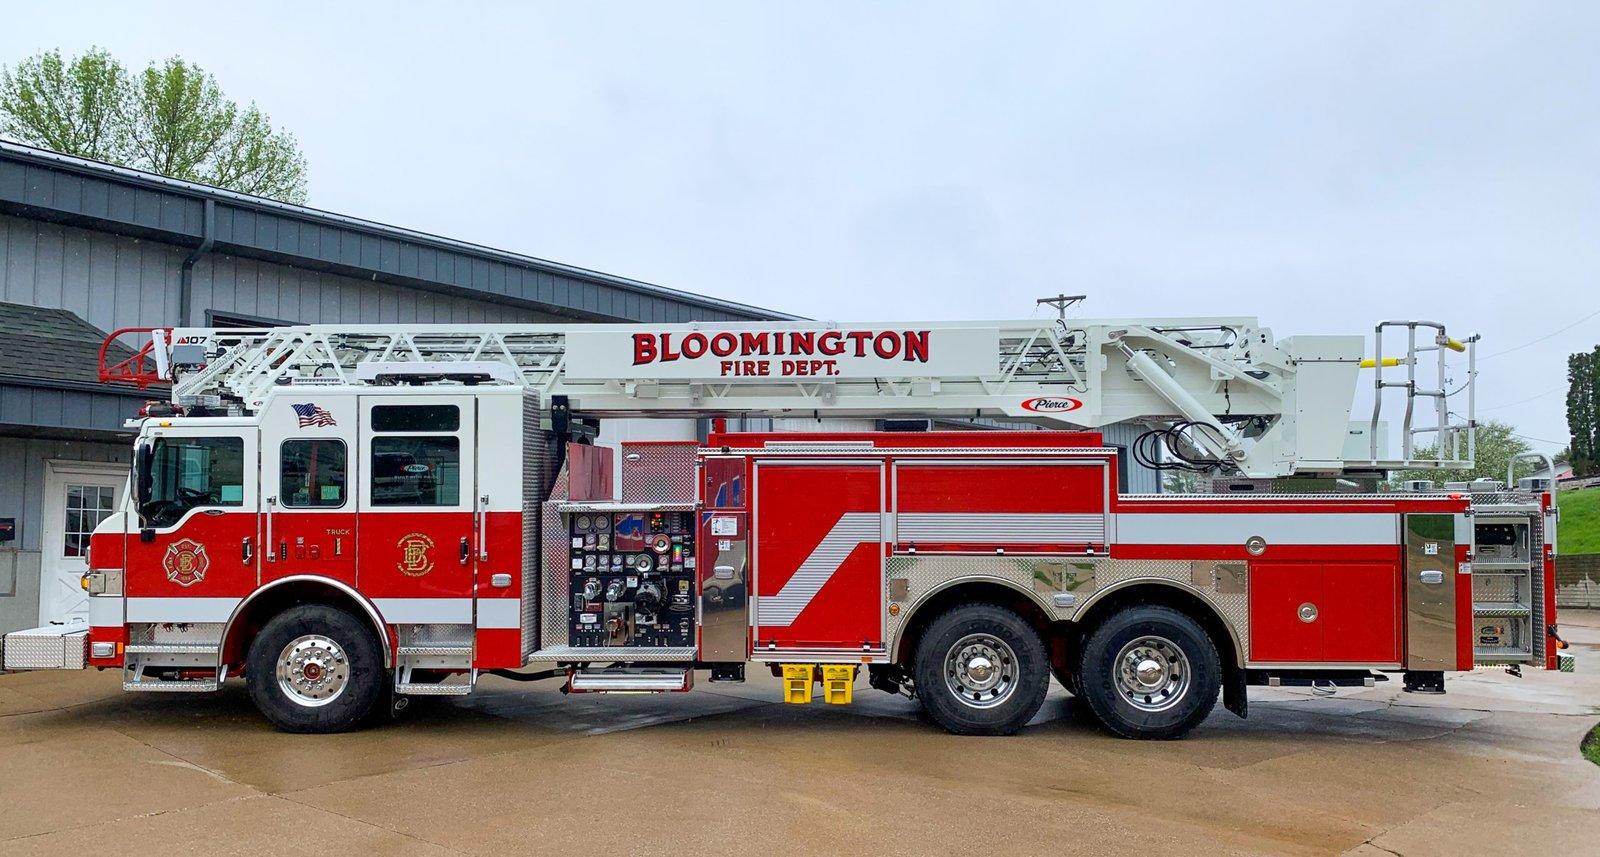 Bloomington Fire Department - Aerial